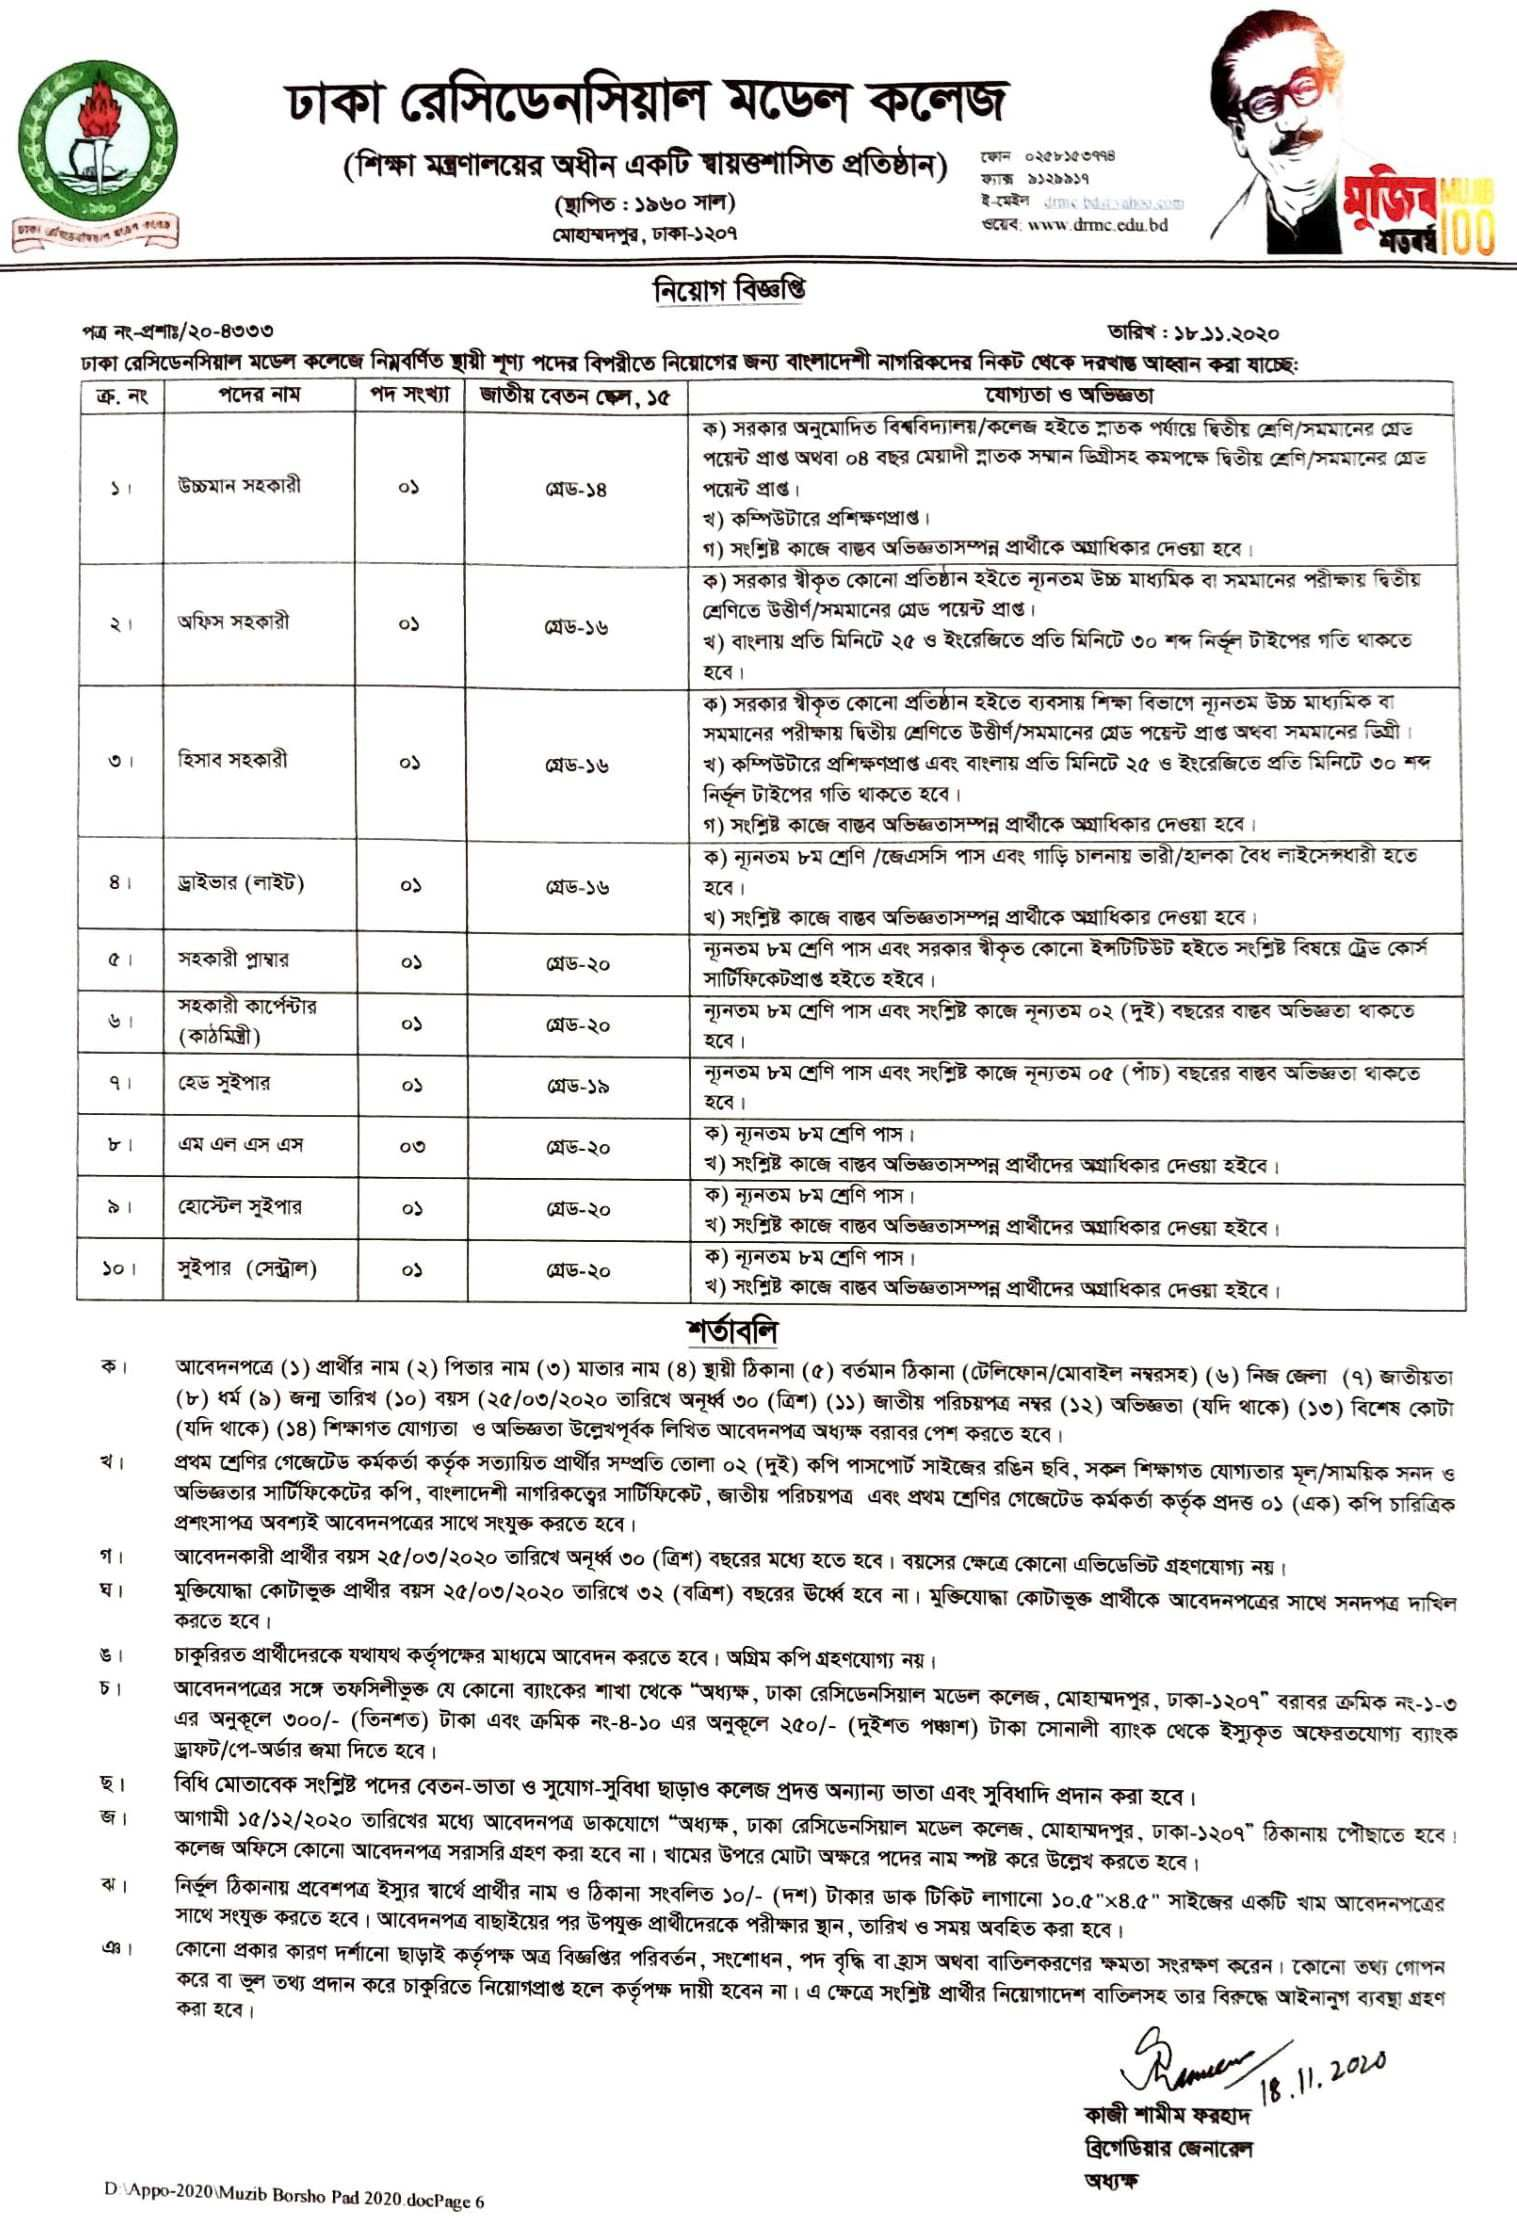 Dhaka Residential Model College Job Circular 2020